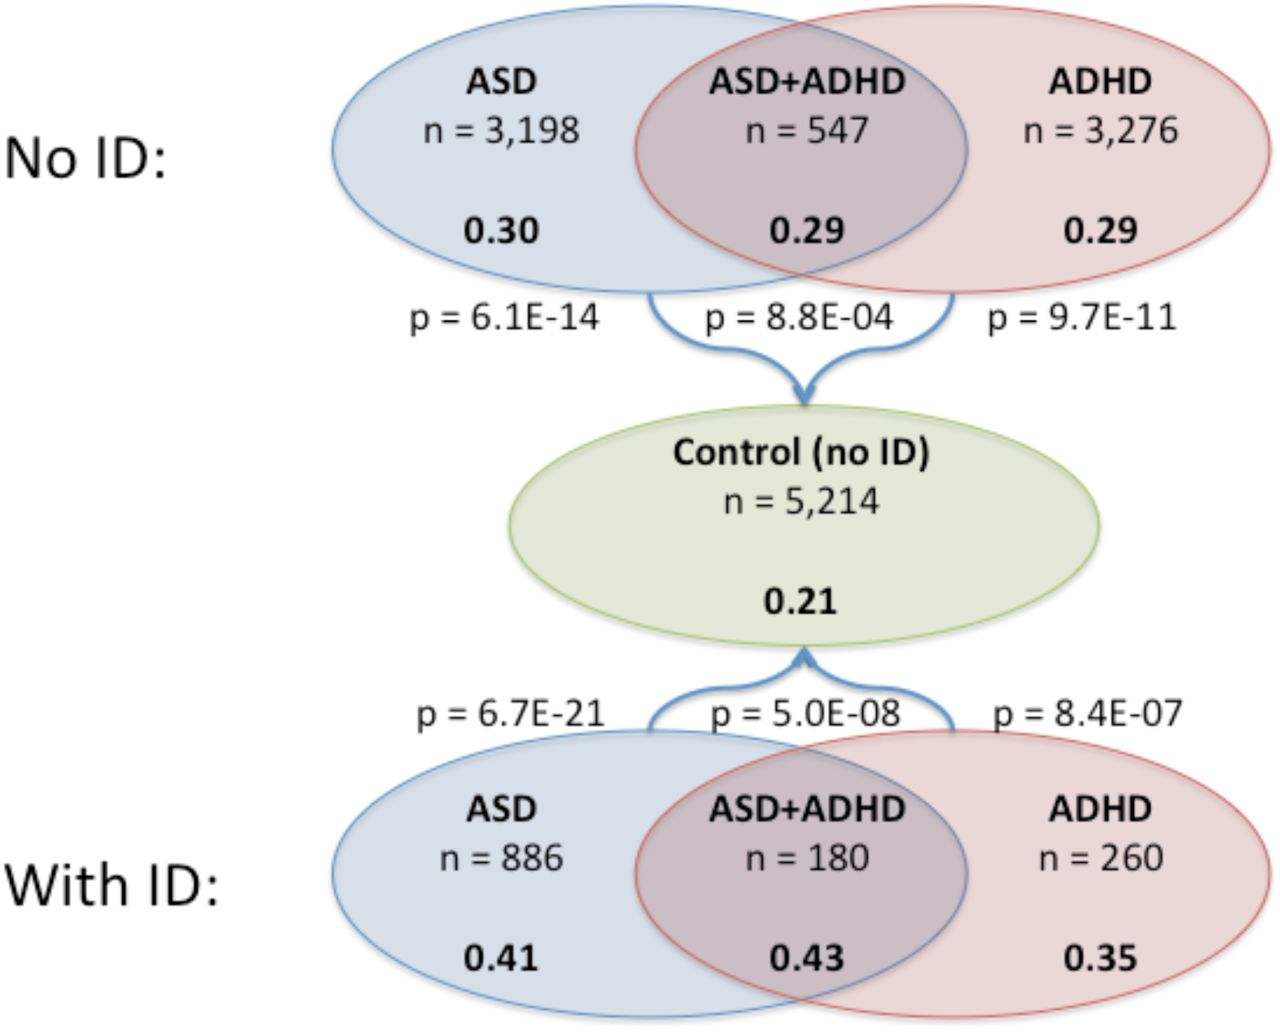 ASD and ADHD have a similar burden of rare protein